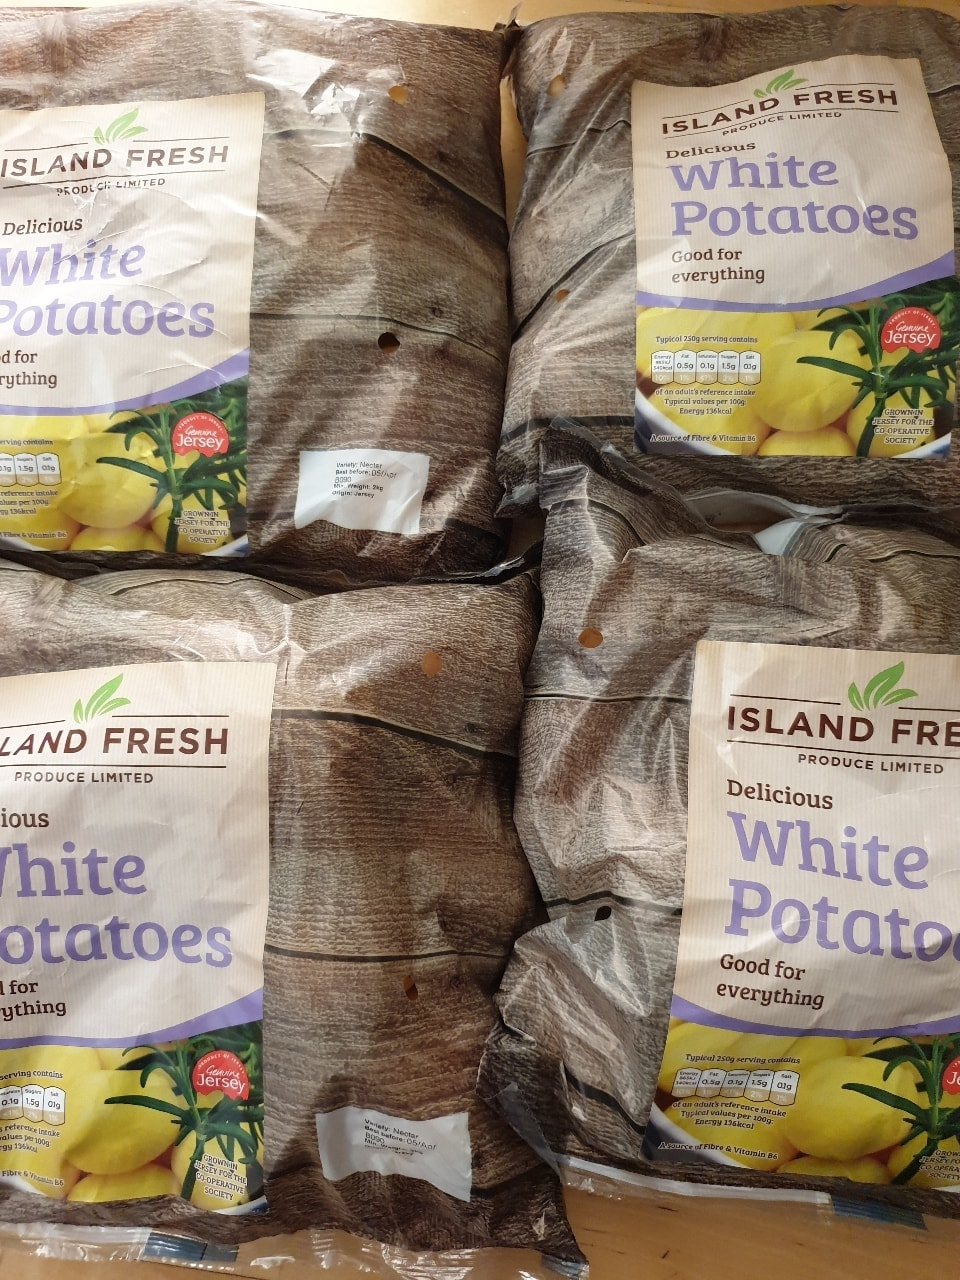 White Potatoes